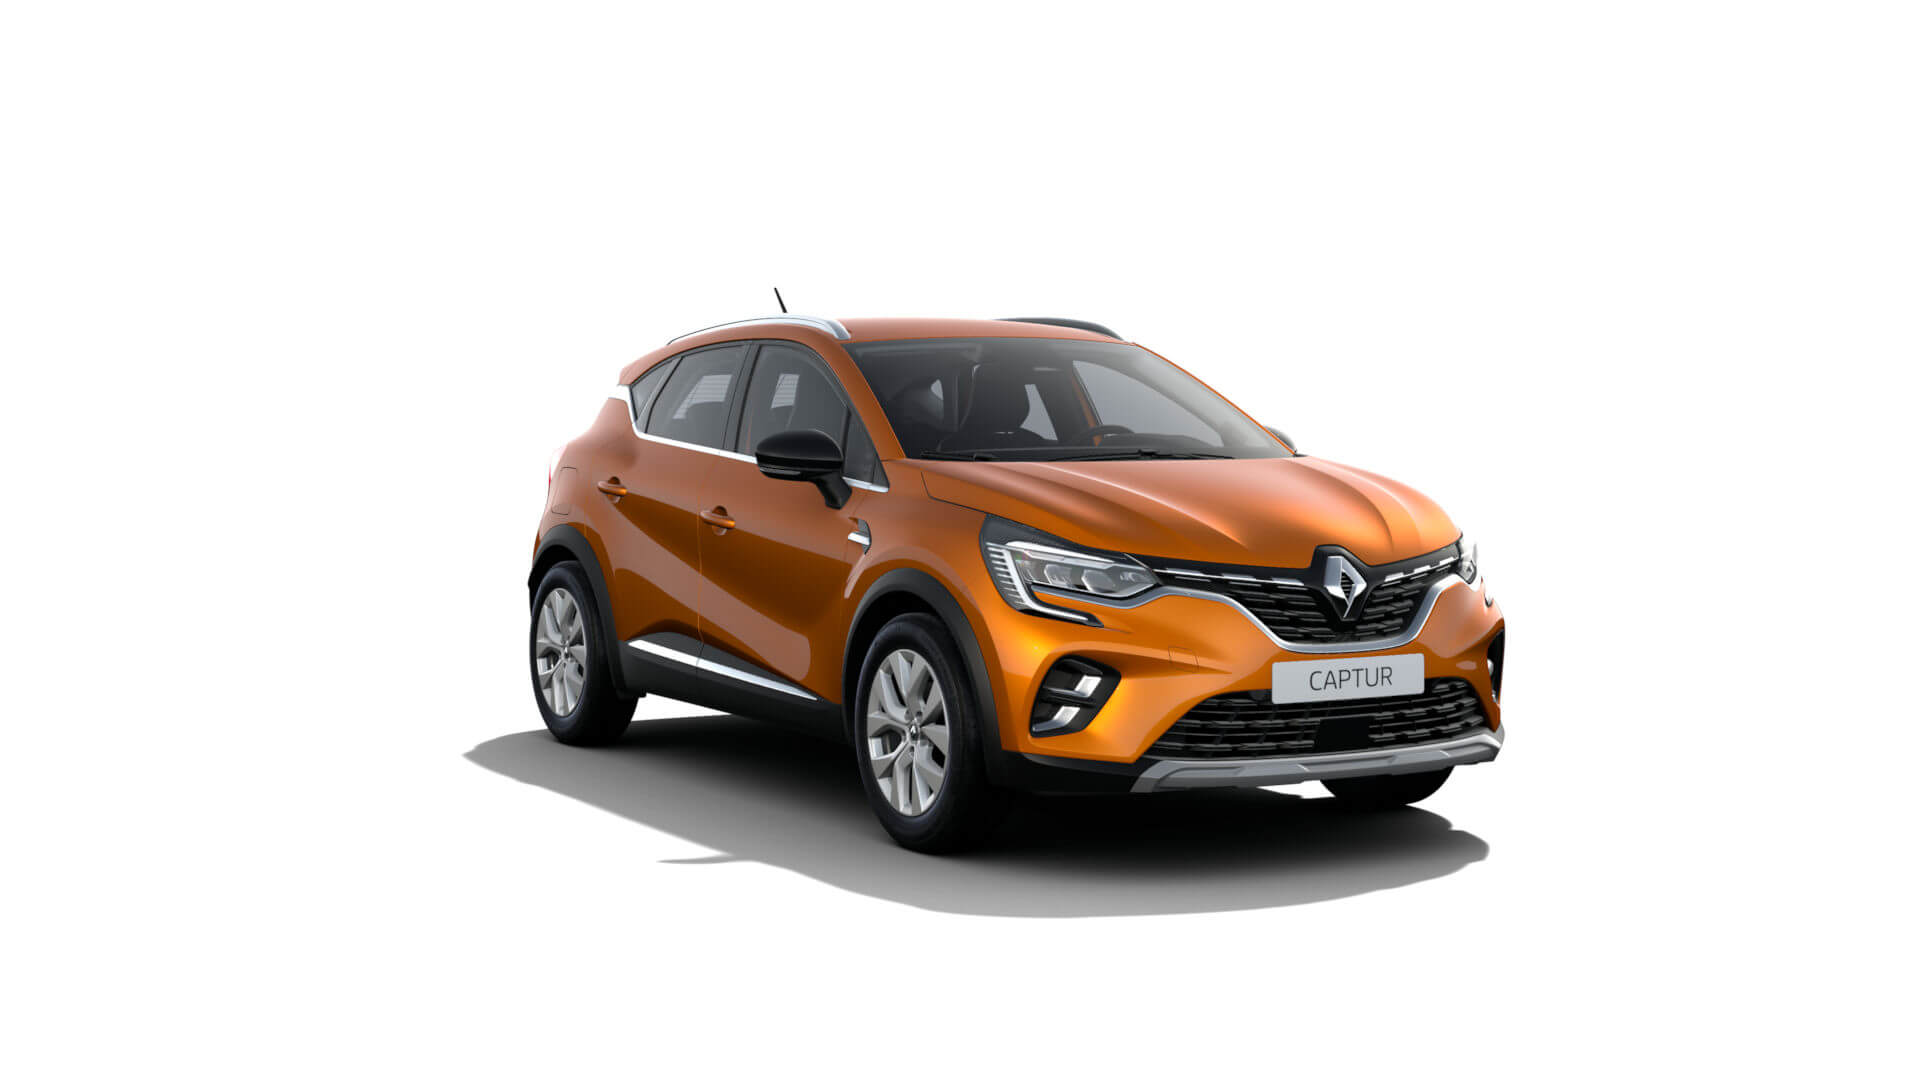 Automodell orange - Renault Captur - Renault Ahrens Hannover